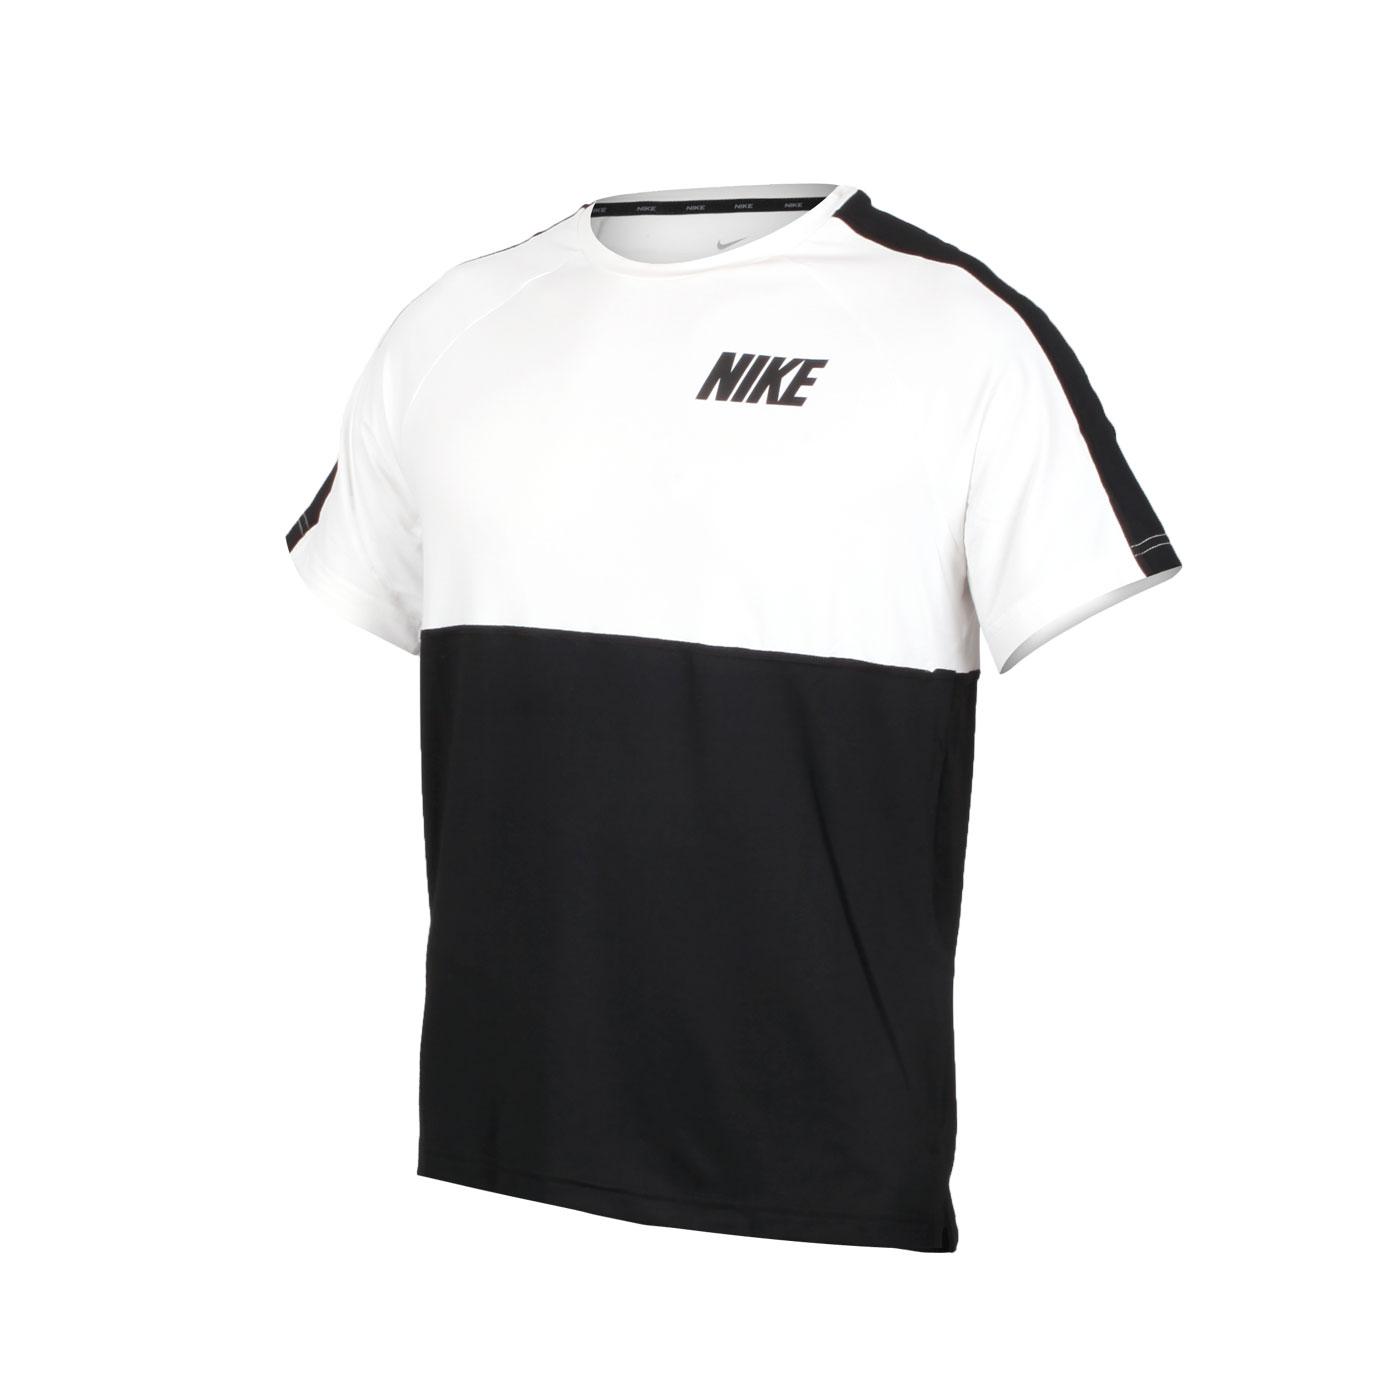 NIKE 男款短袖T恤 CU4047-100